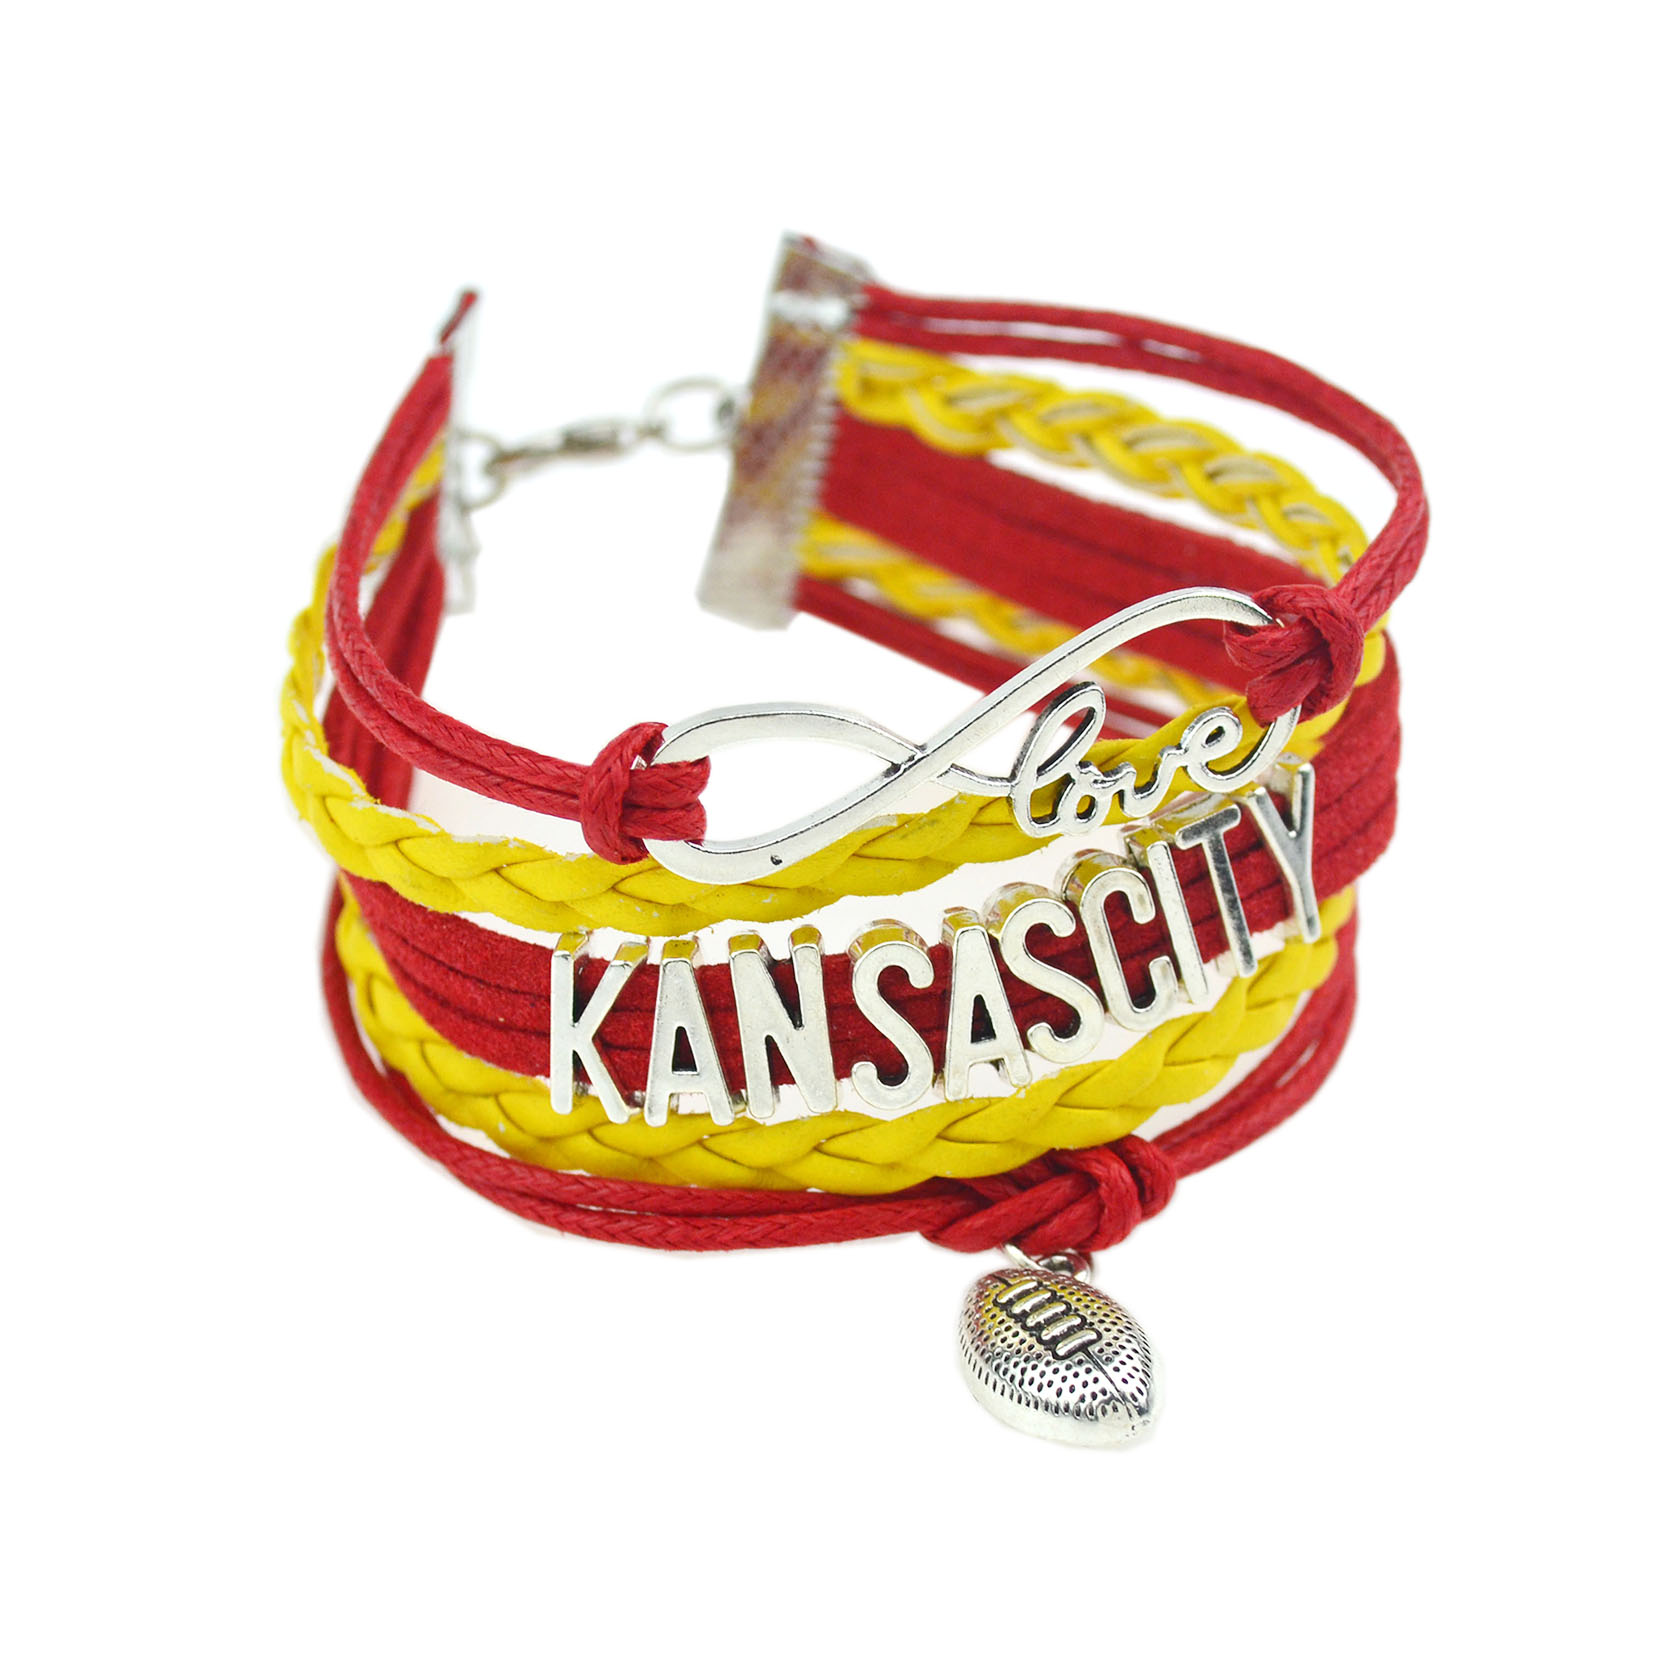 11 NCAA Teams Bracelet 2016 Newest Design American Football KANSASCITY USC Leather Bracelets & Bangles Fashion Man Jewelry(China (Mainland))